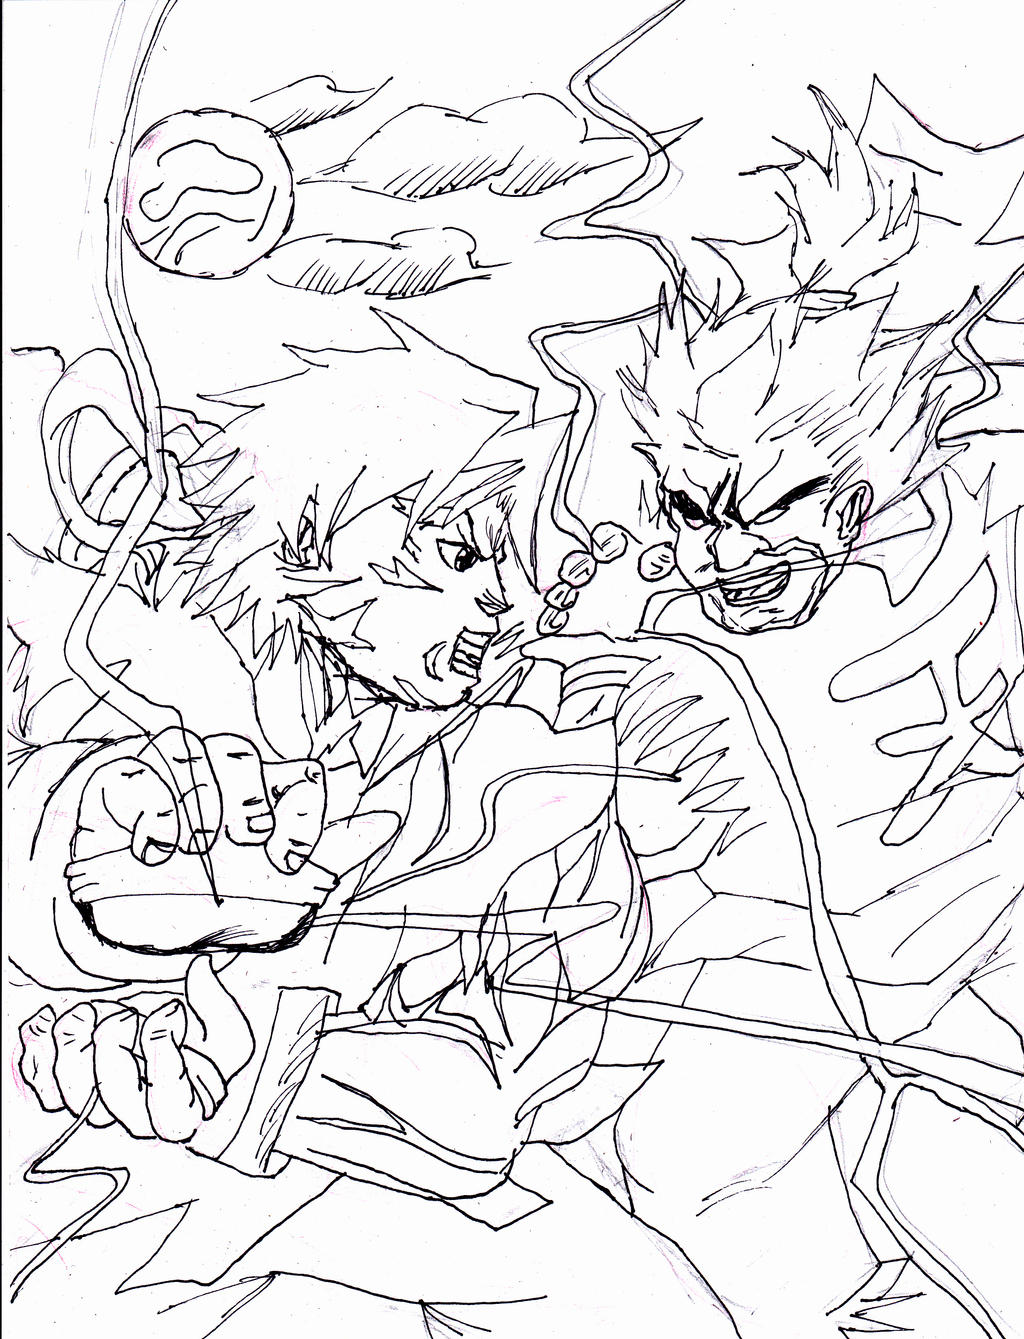 ryu coloring pages - ryu vs akuma by sugoroku hyru on deviantart